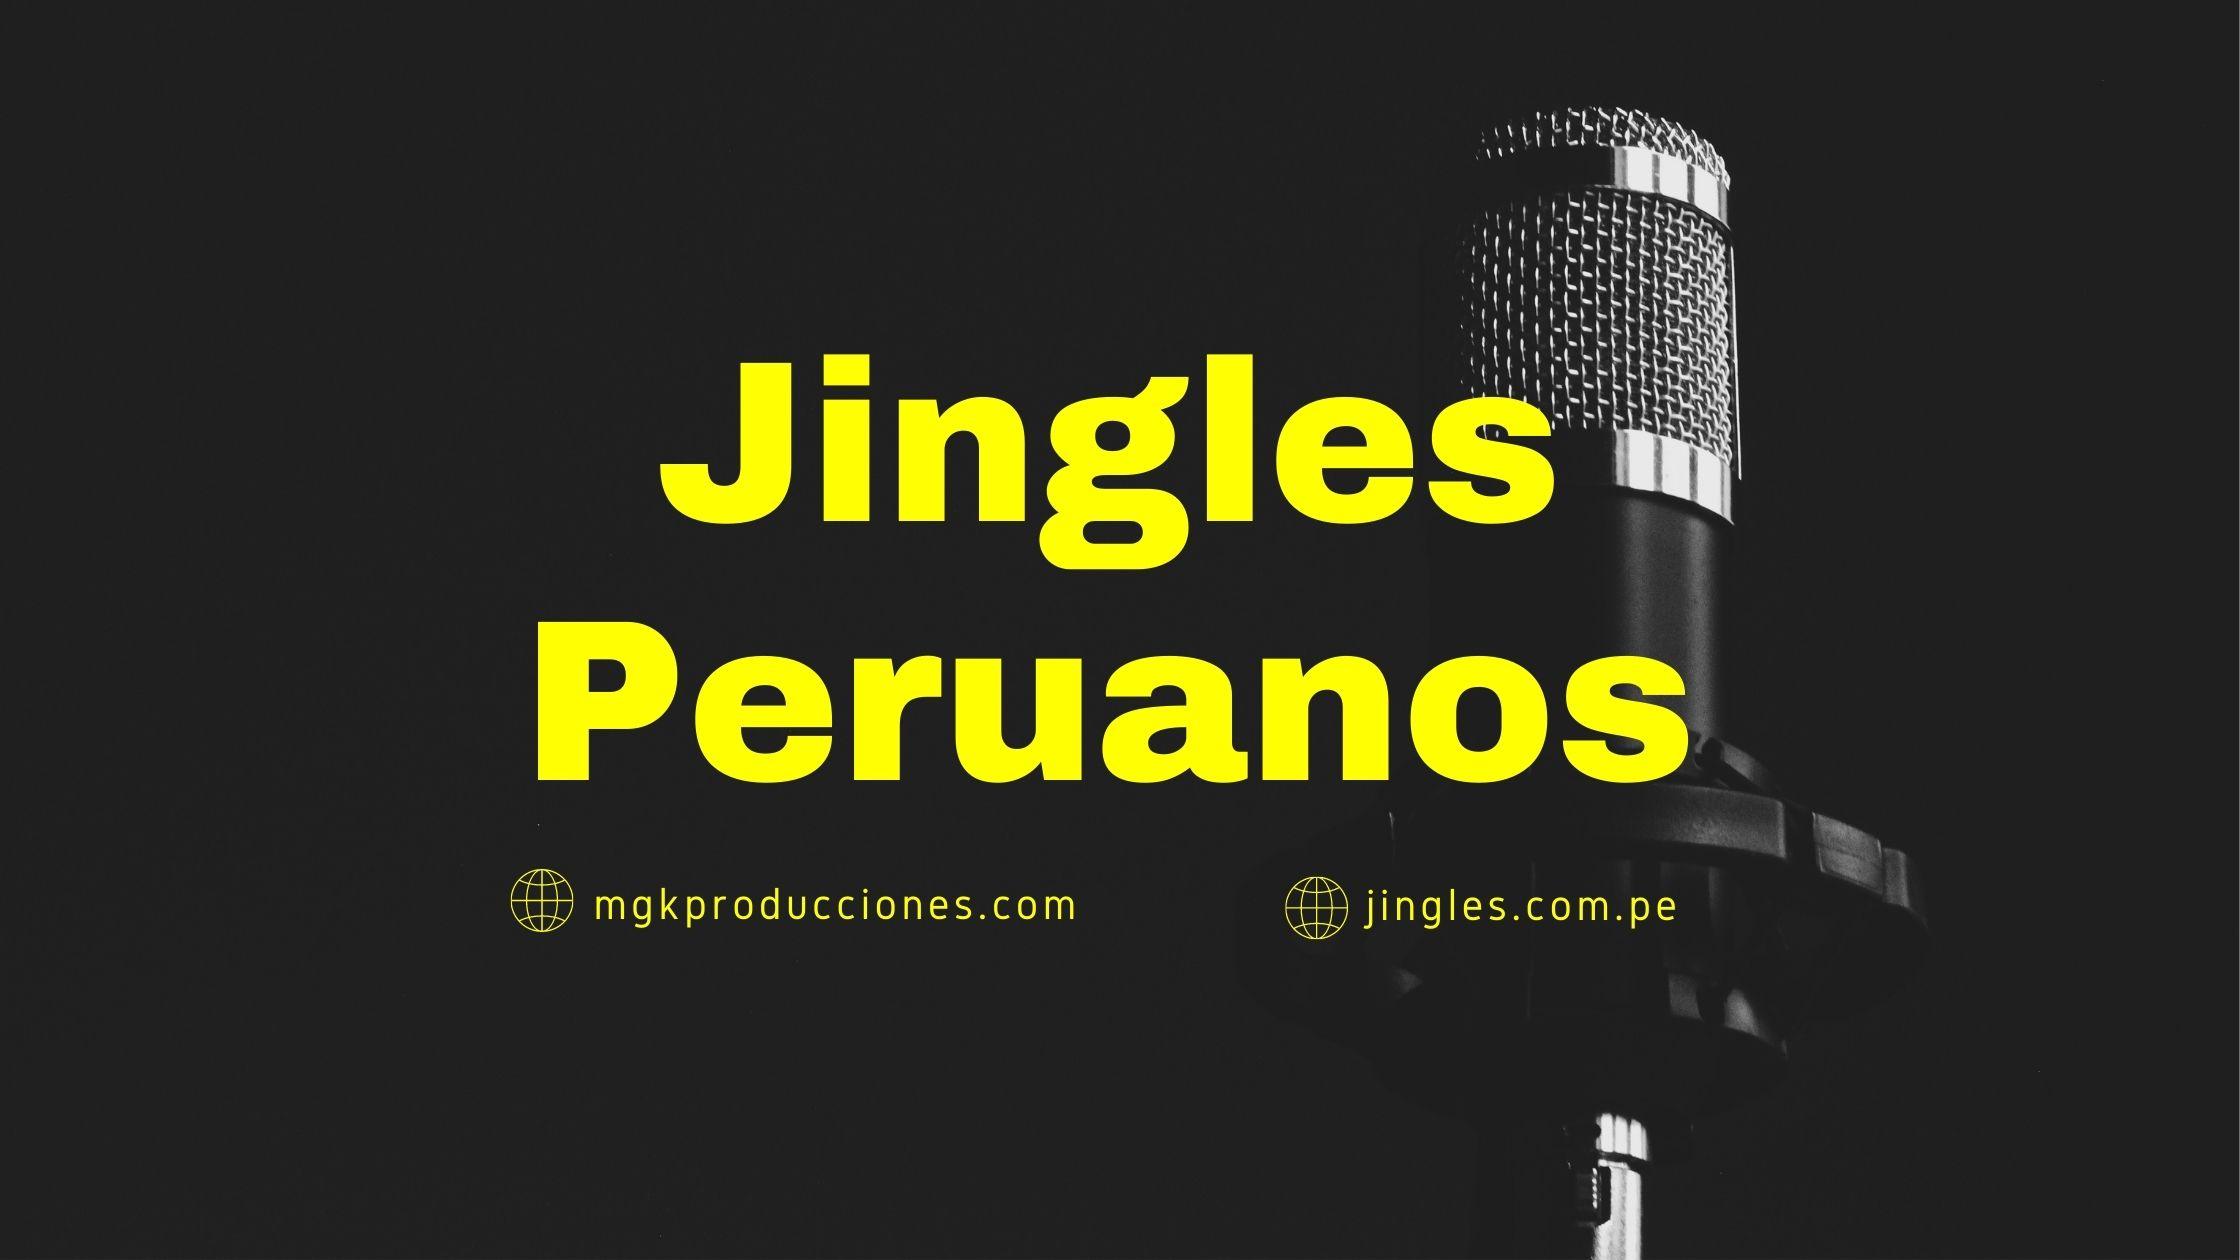 jingles peruanos